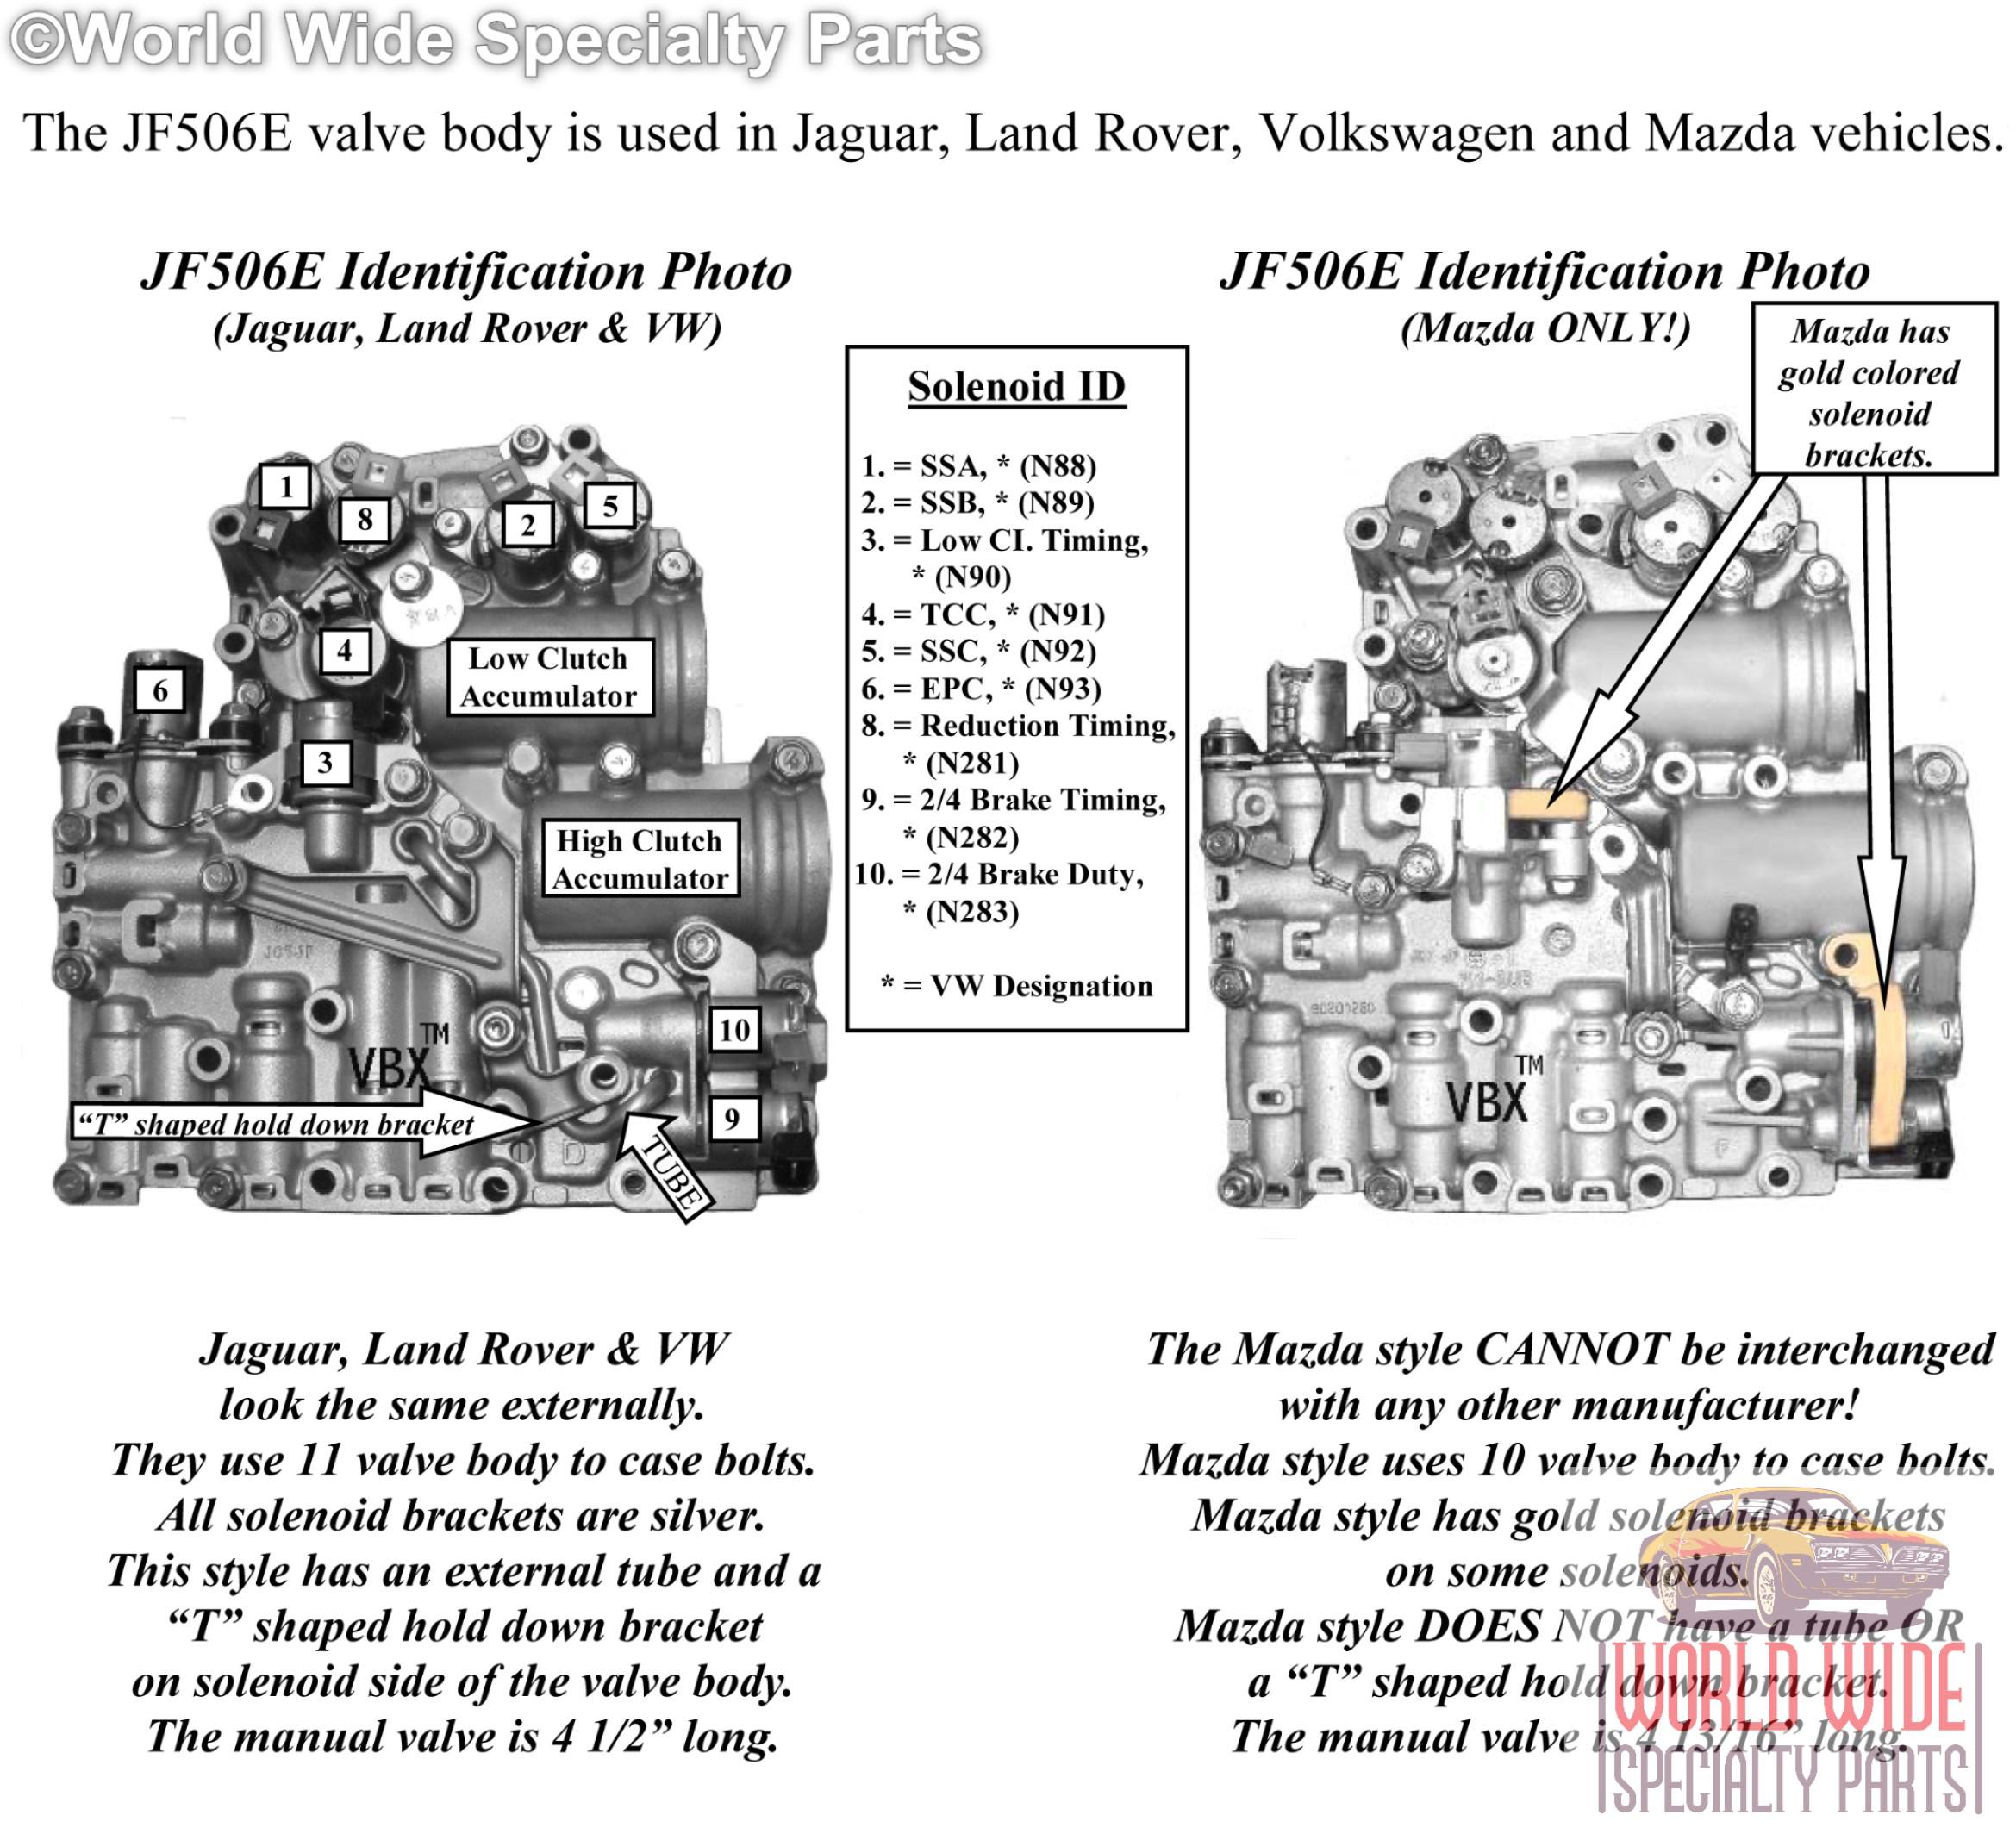 2002 Mazda Mpv Cooling System Diagram 2000 Engine Coolant